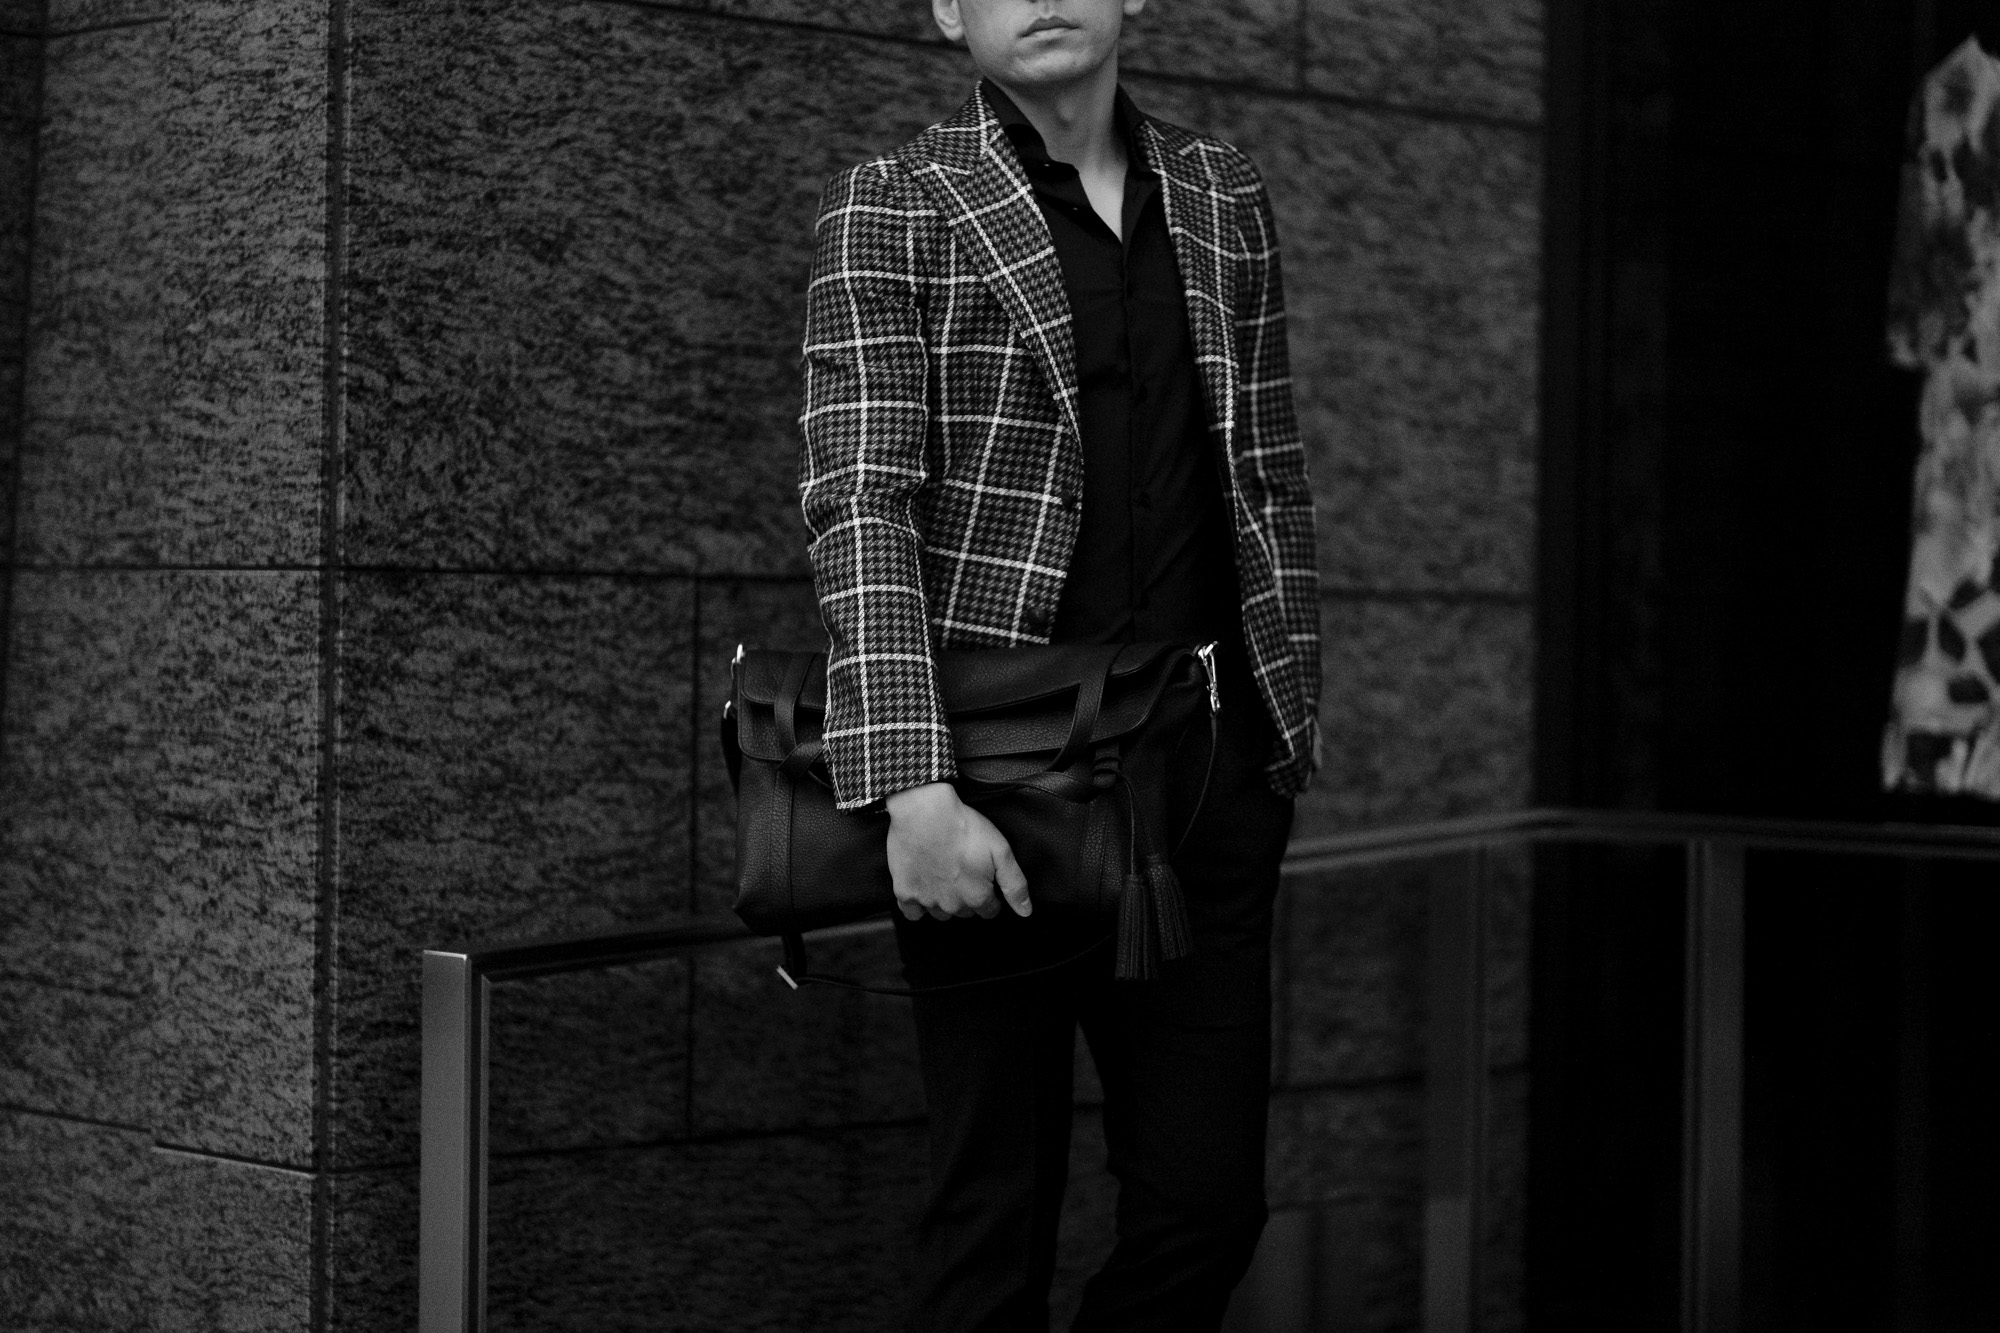 ACATE (アカーテ) GREGALE(グレゲール) Montblanc leather (モンブランレザー) レザーバッグ NERO (ネロ) MADE IN ITALY (イタリア製) 2021【Special Model】【Alto e Diritto別注】愛知 名古屋 Alto e Diritto altoediritto アルトエデリット ショルダーバック